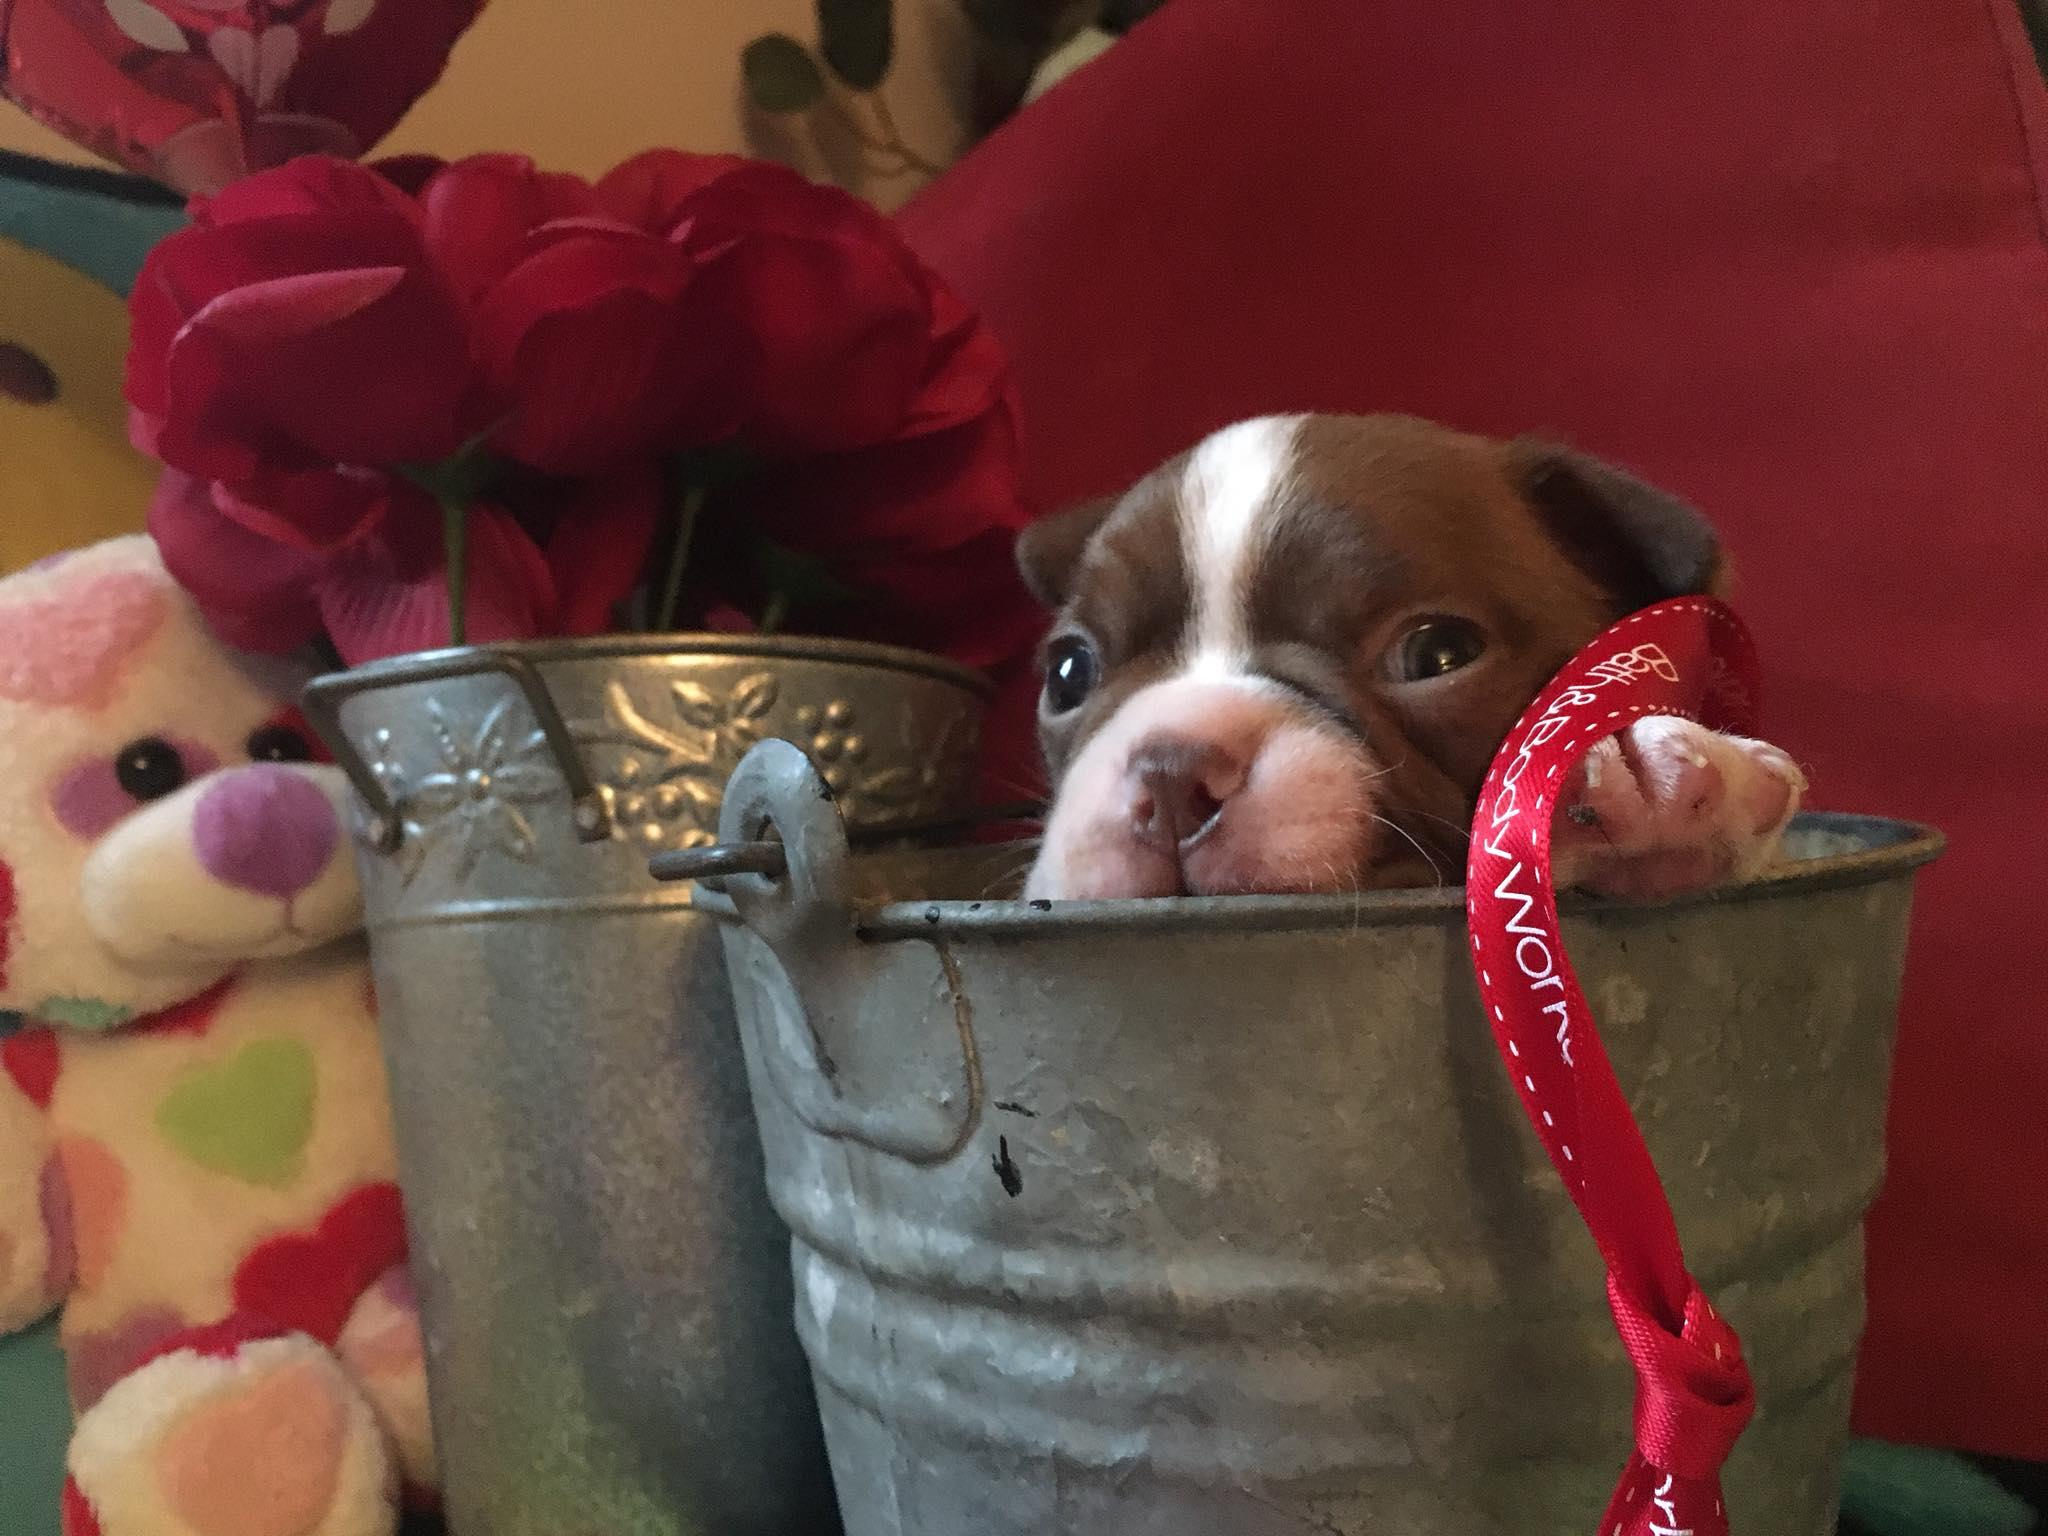 Stormy in a bucket